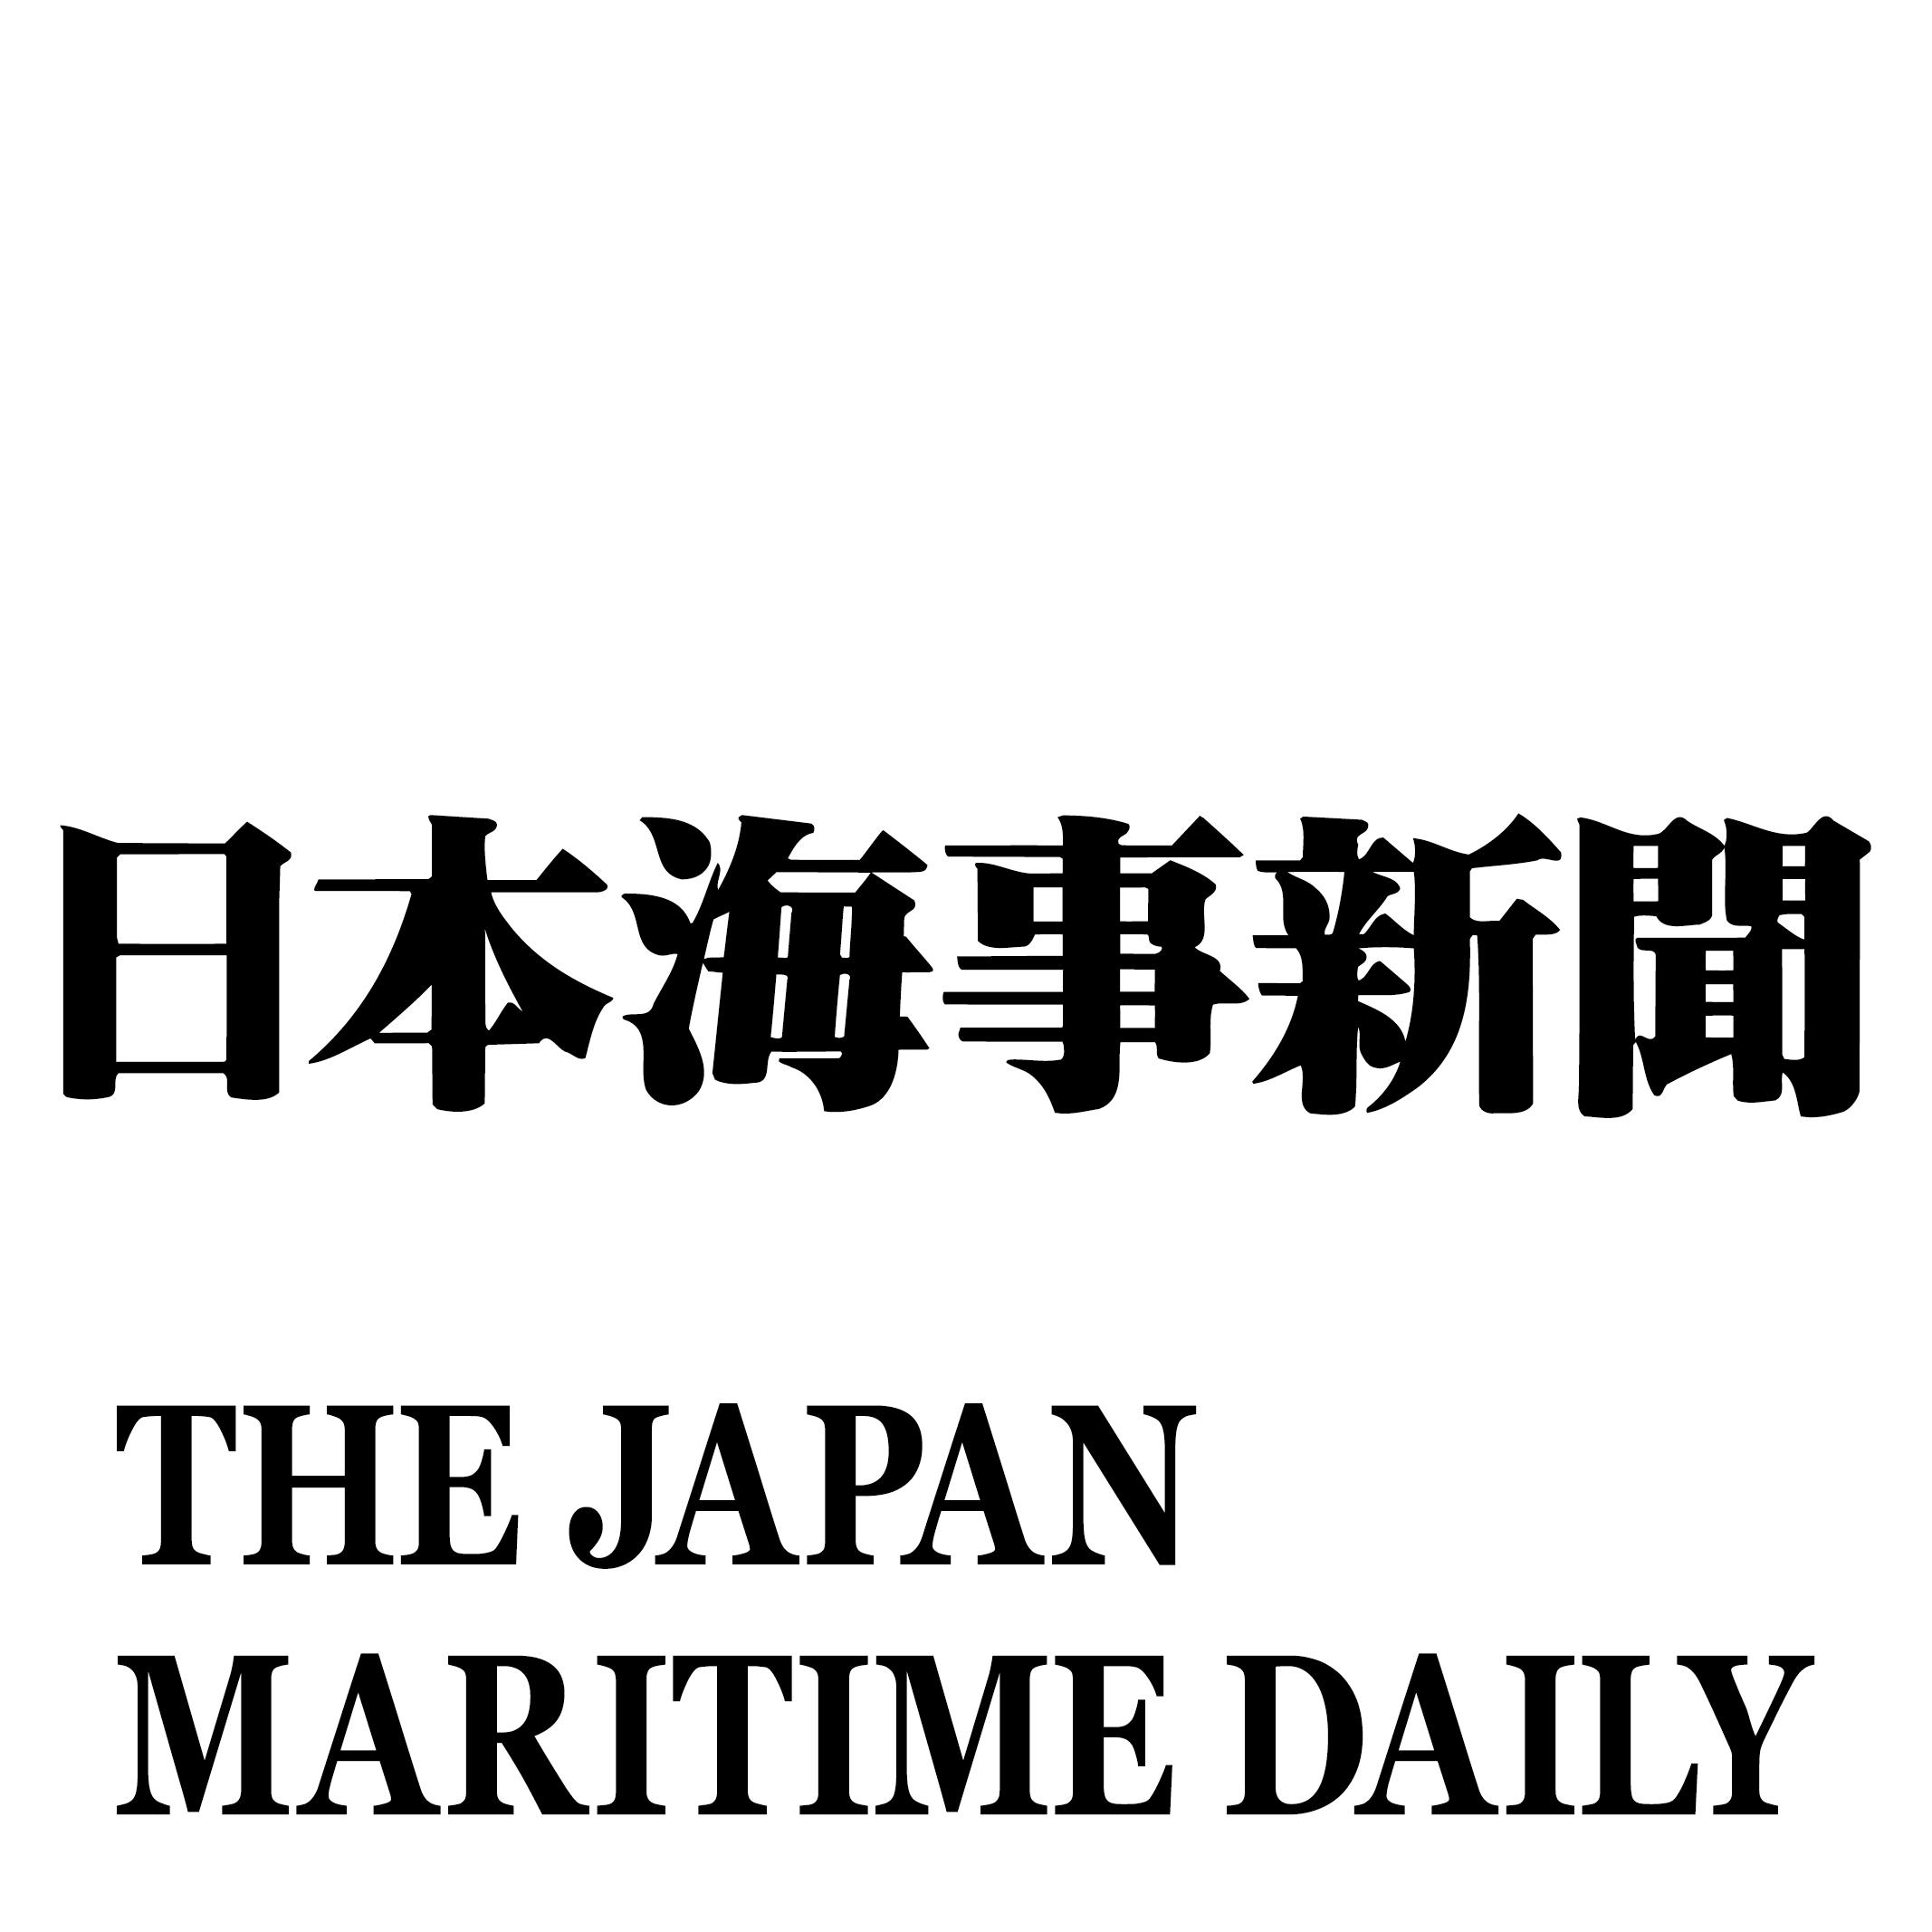 乗船前PCR、複数受検も。検査機関の独自指定で|日本海事新聞 電子版